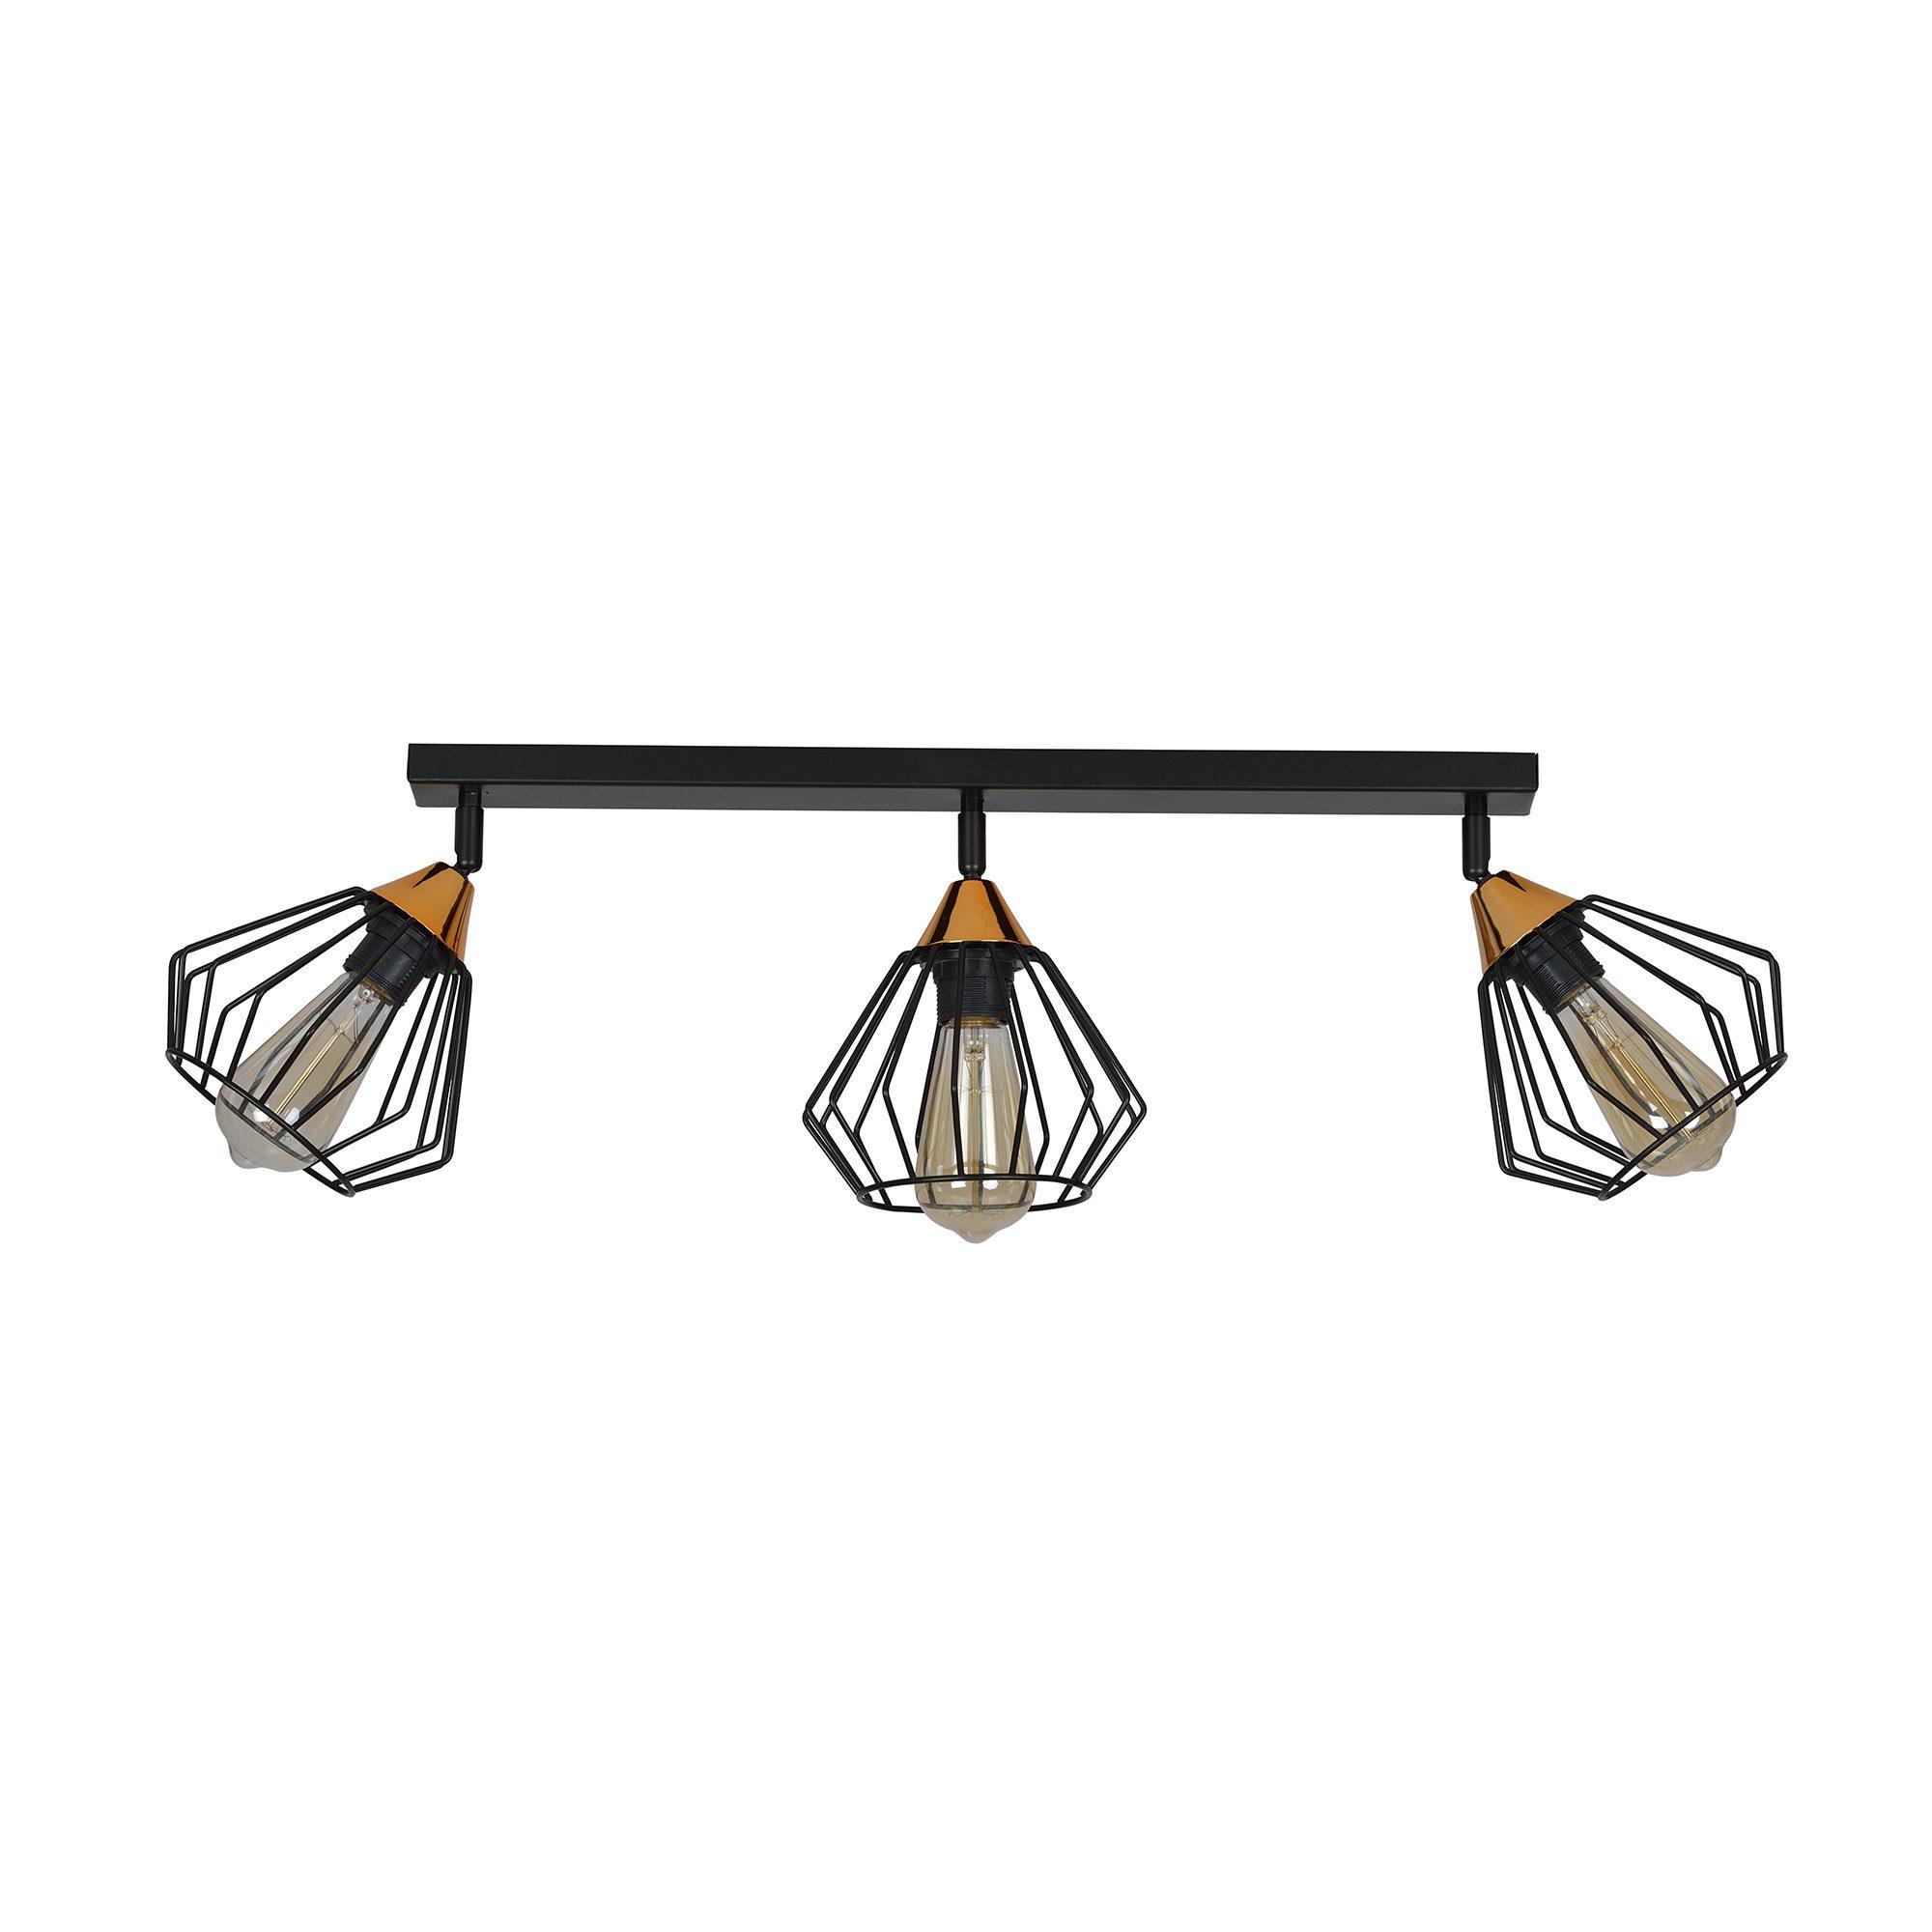 czarna-lampa-diamenty-industrialna-regulowana-kuchenna